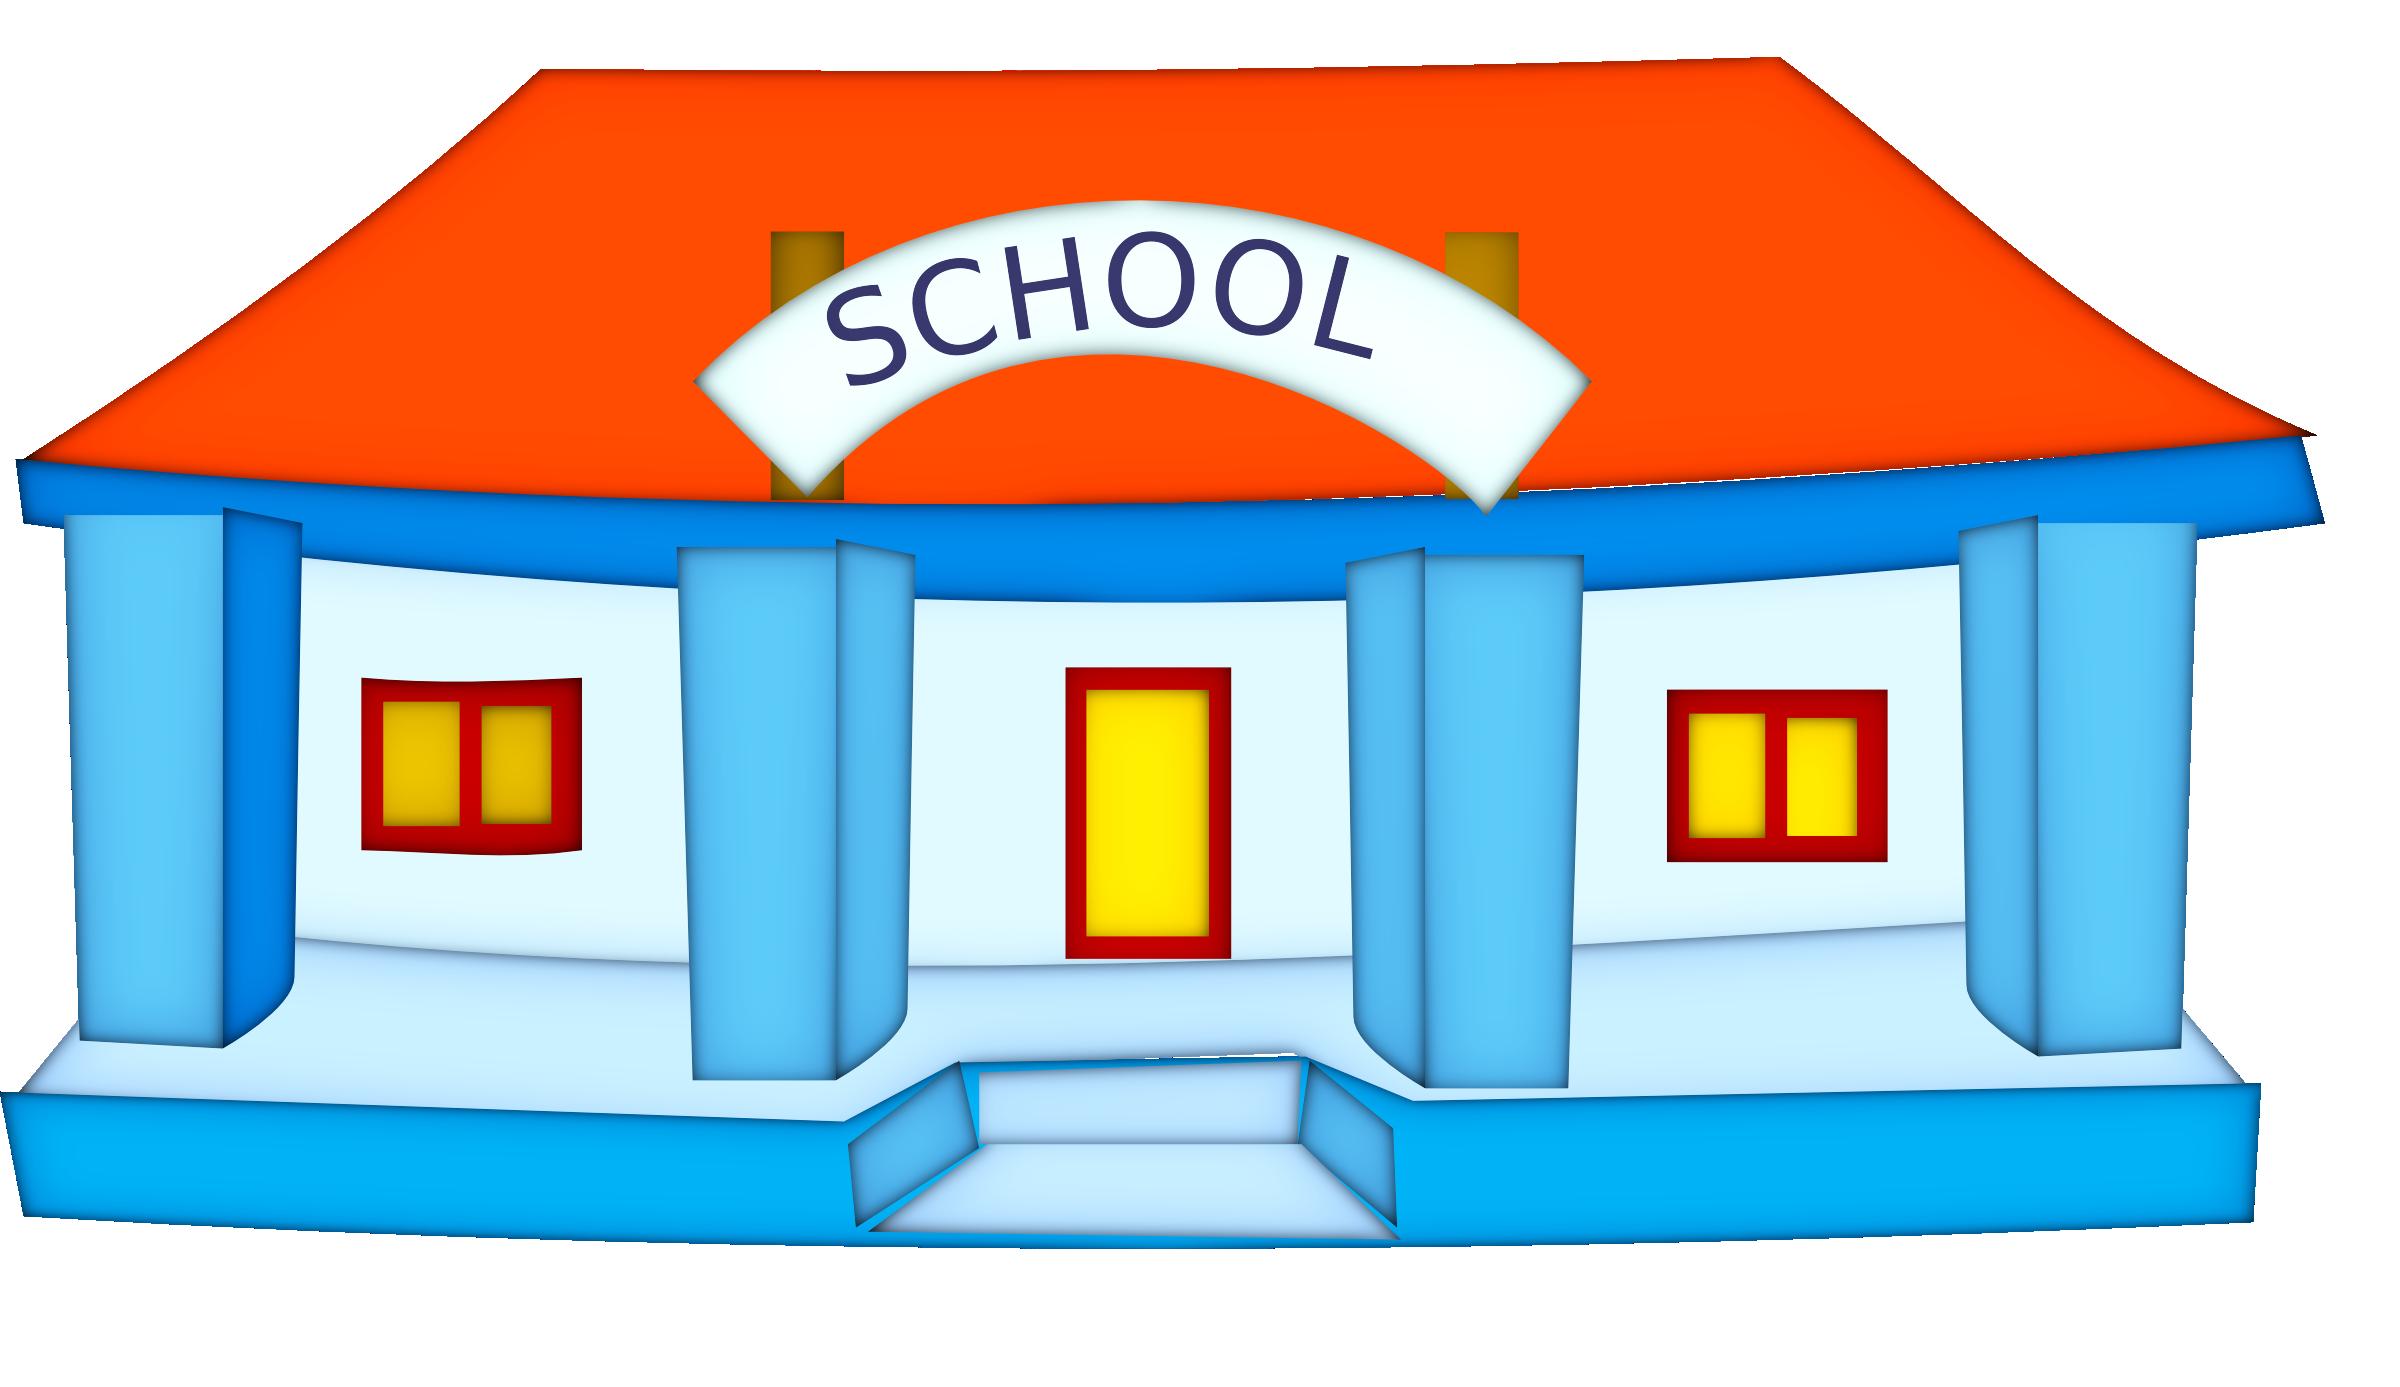 2400x1387 School Clipart Free Clip Art Images